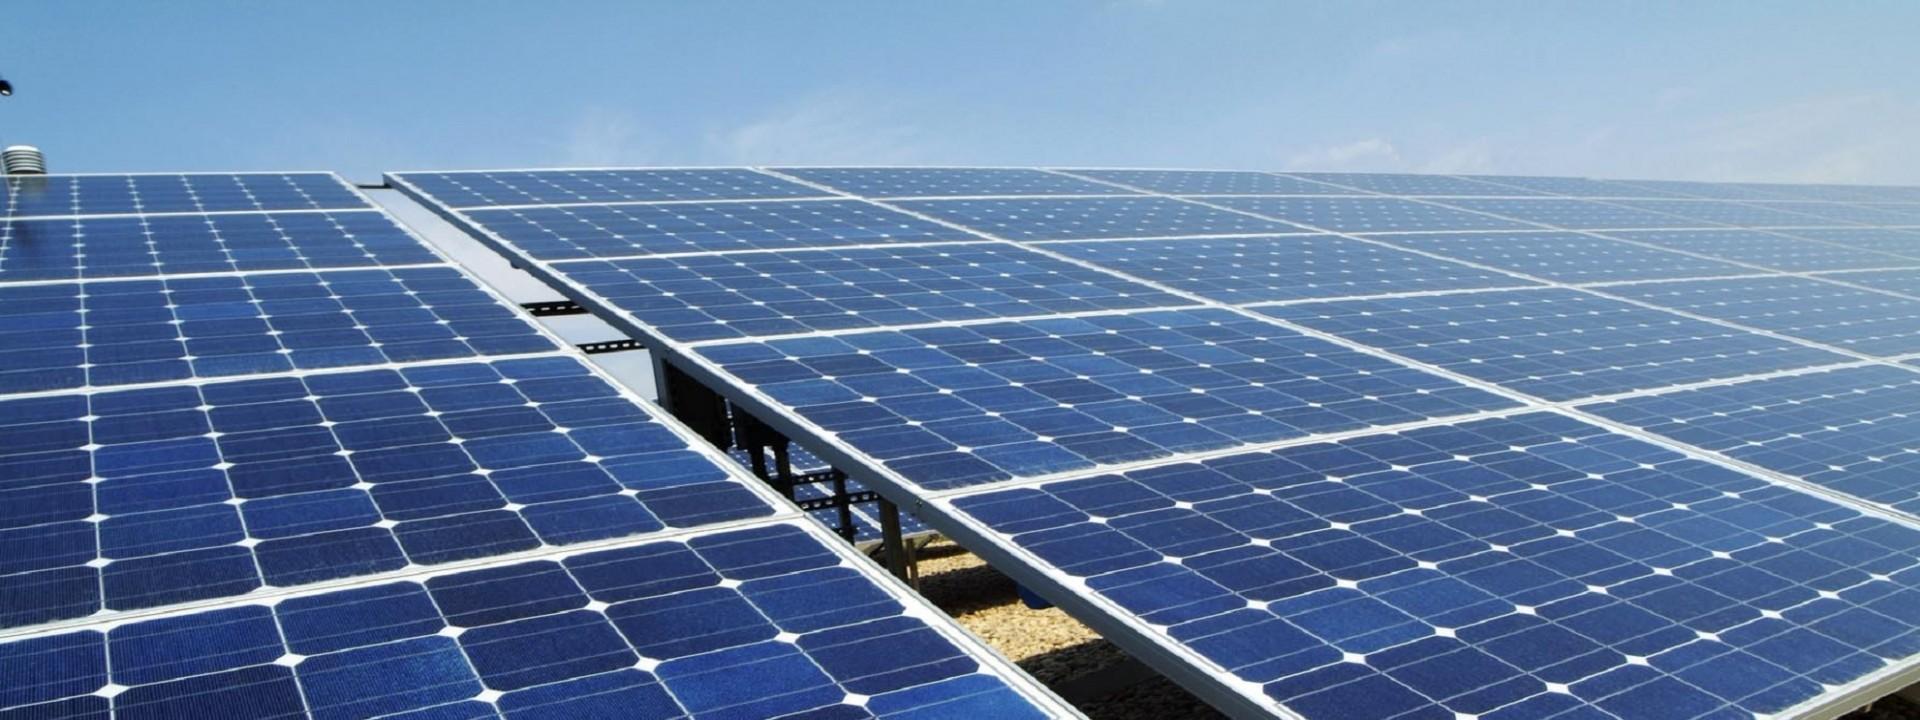 Renewable Energy & On Site Generation